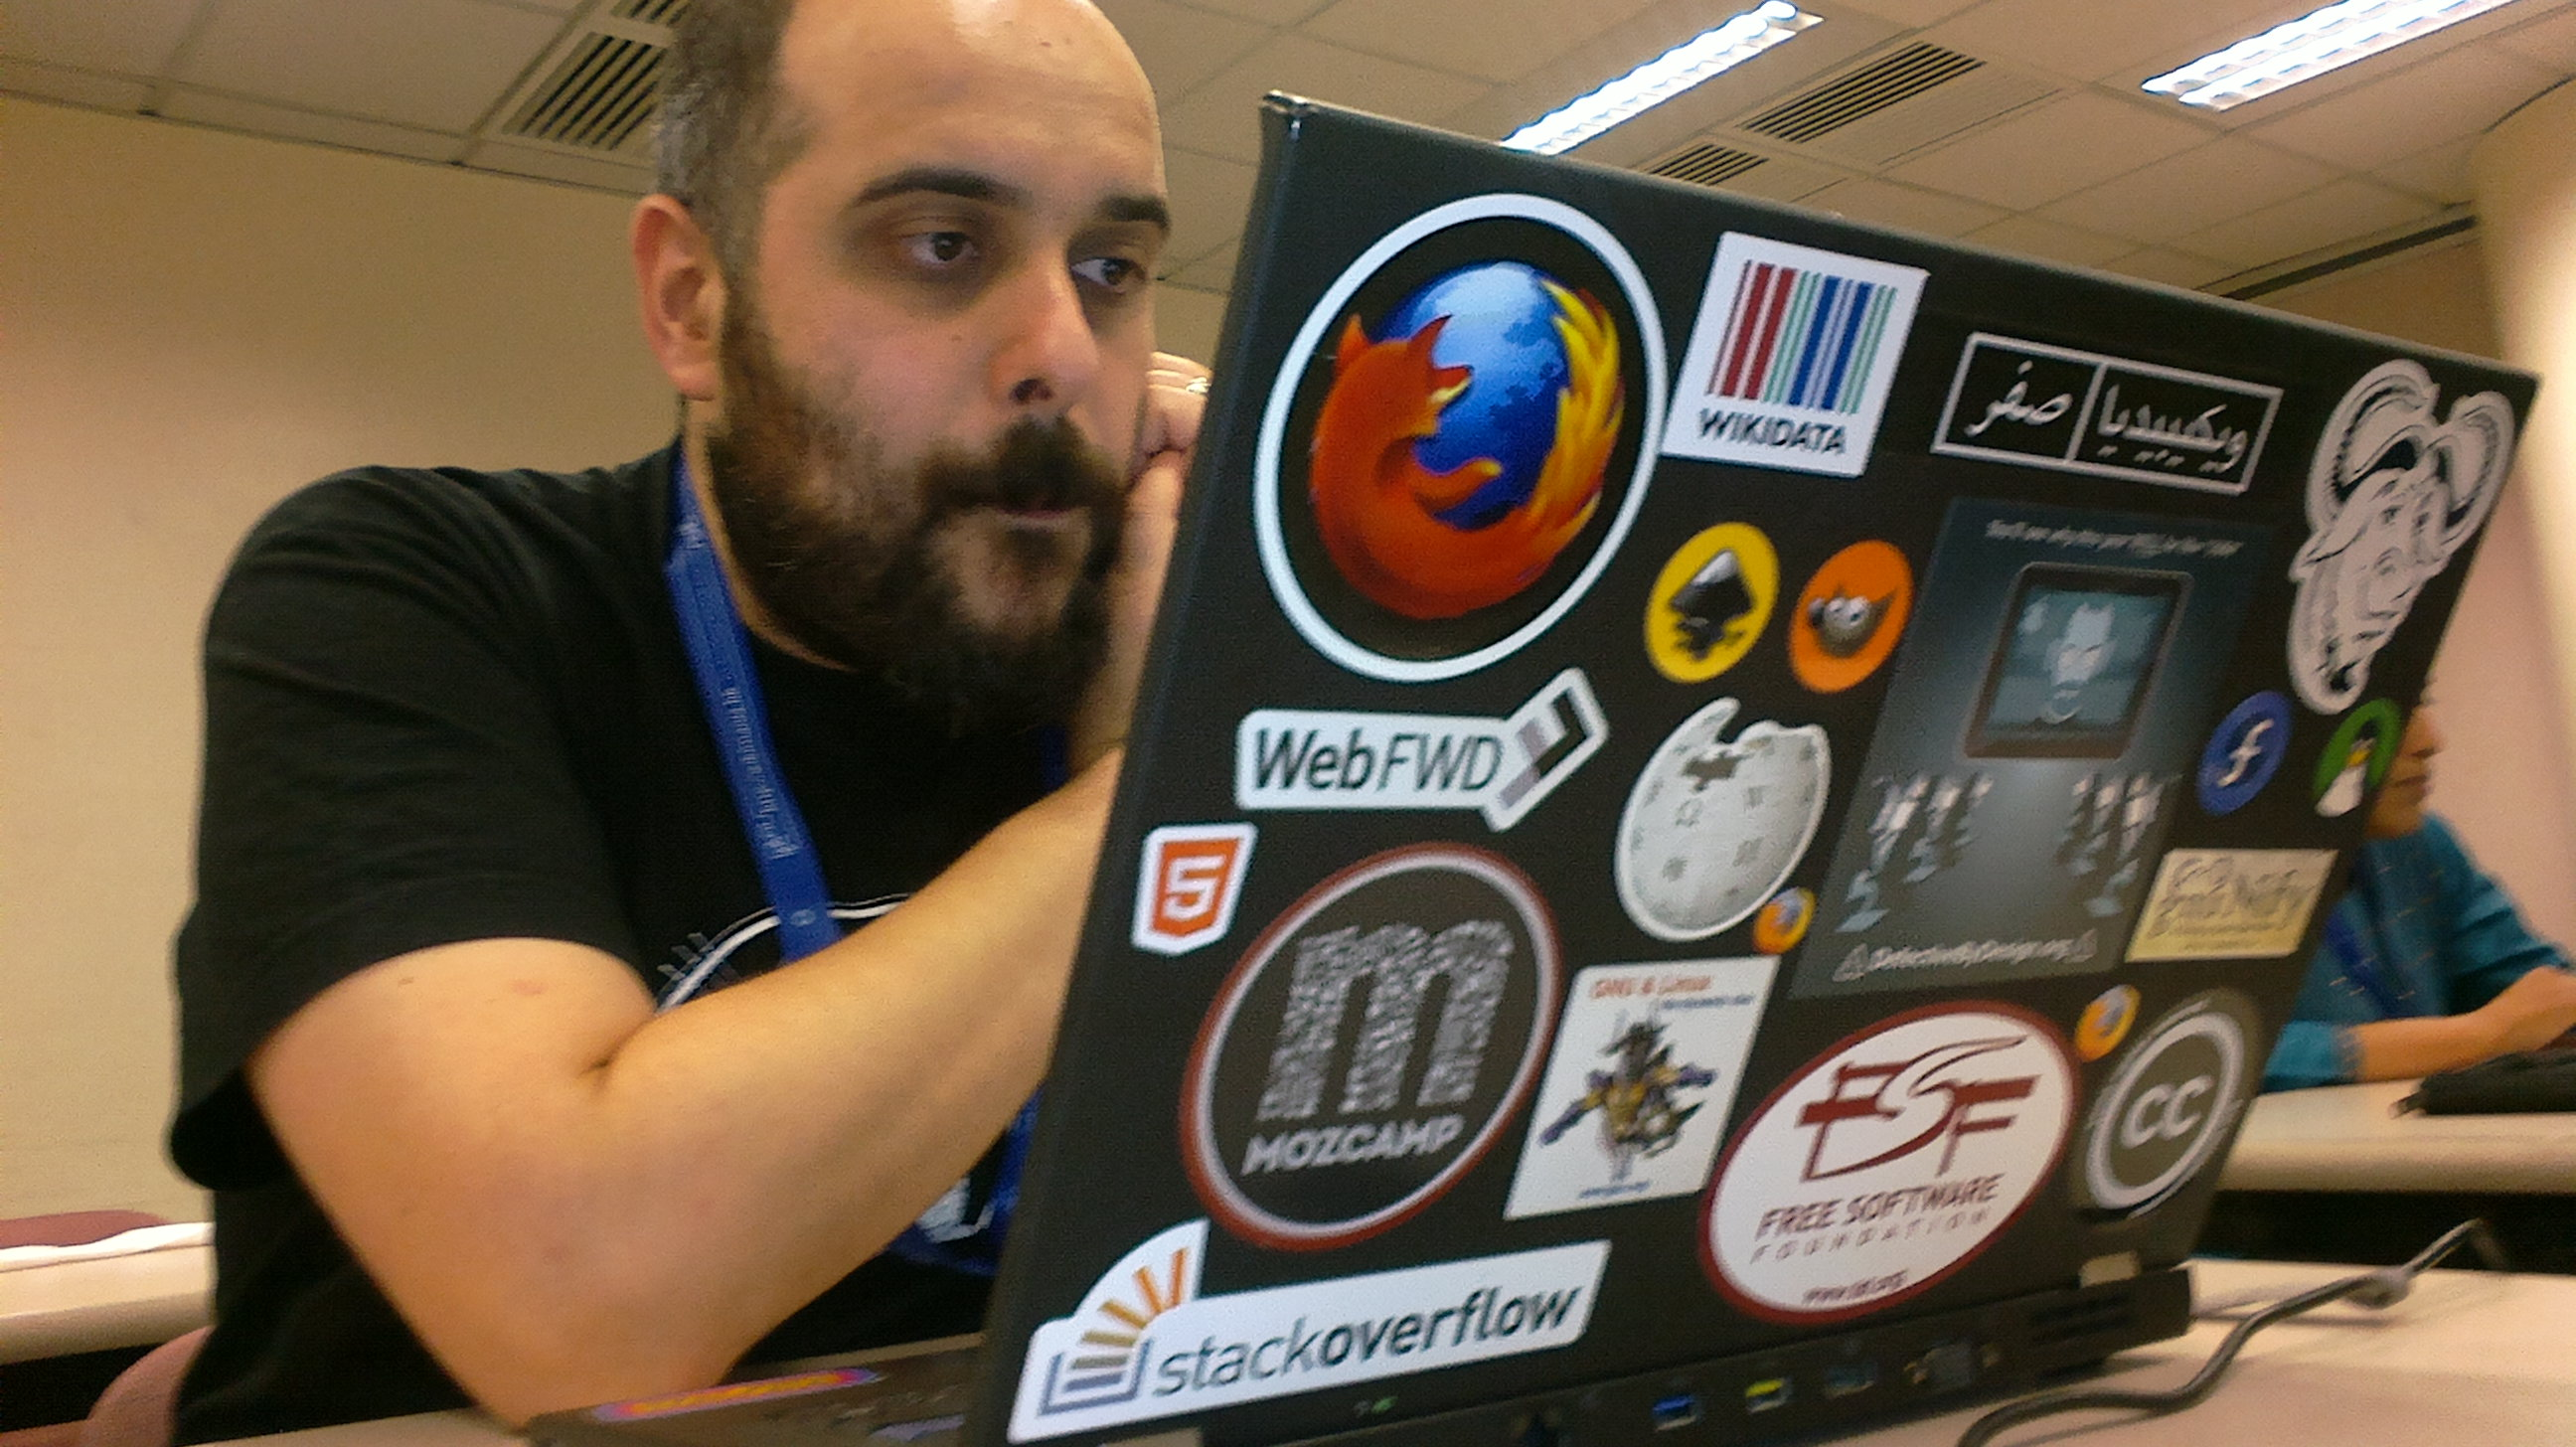 Amir Aharoni on Devs Wikimania 2013. Photo: Lvova. License: CC-BY-SA-3.0